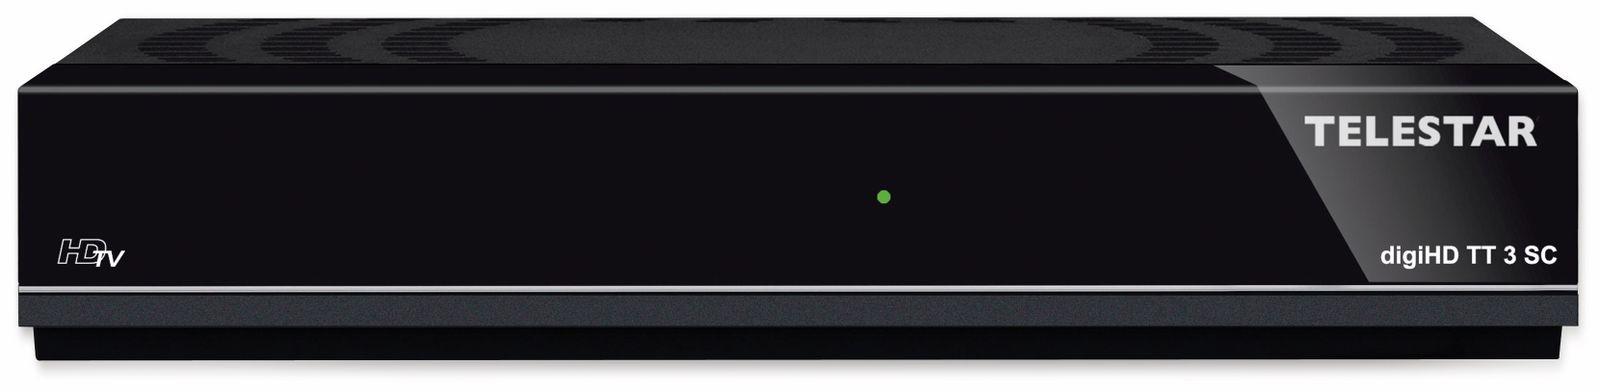 dvb t2 hdtv receiver telestar digihd tt 3 sc online kaufen. Black Bedroom Furniture Sets. Home Design Ideas